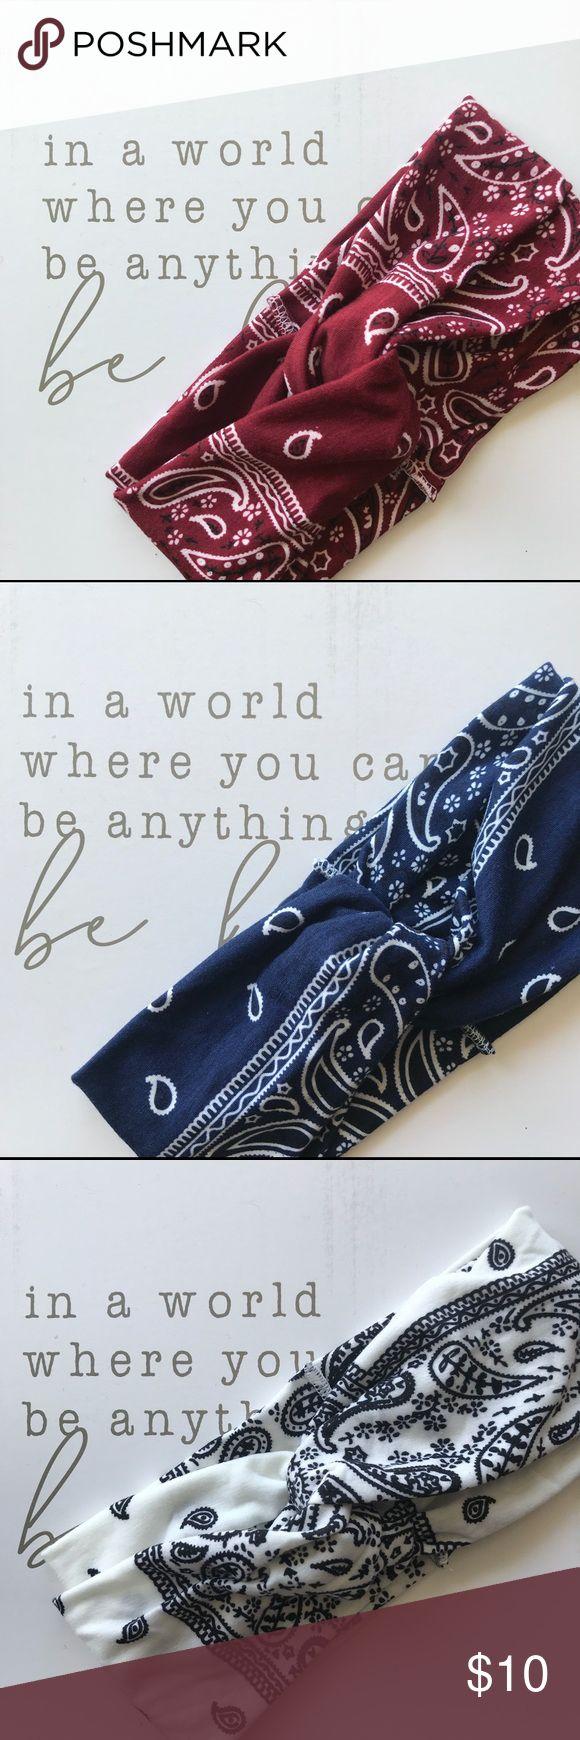 🌳twisted yoga bandana print headband🌳 Bandana paisley print soft stretch cotton twist yoga headband  Super soft stretch comfortable cotton  Choo...